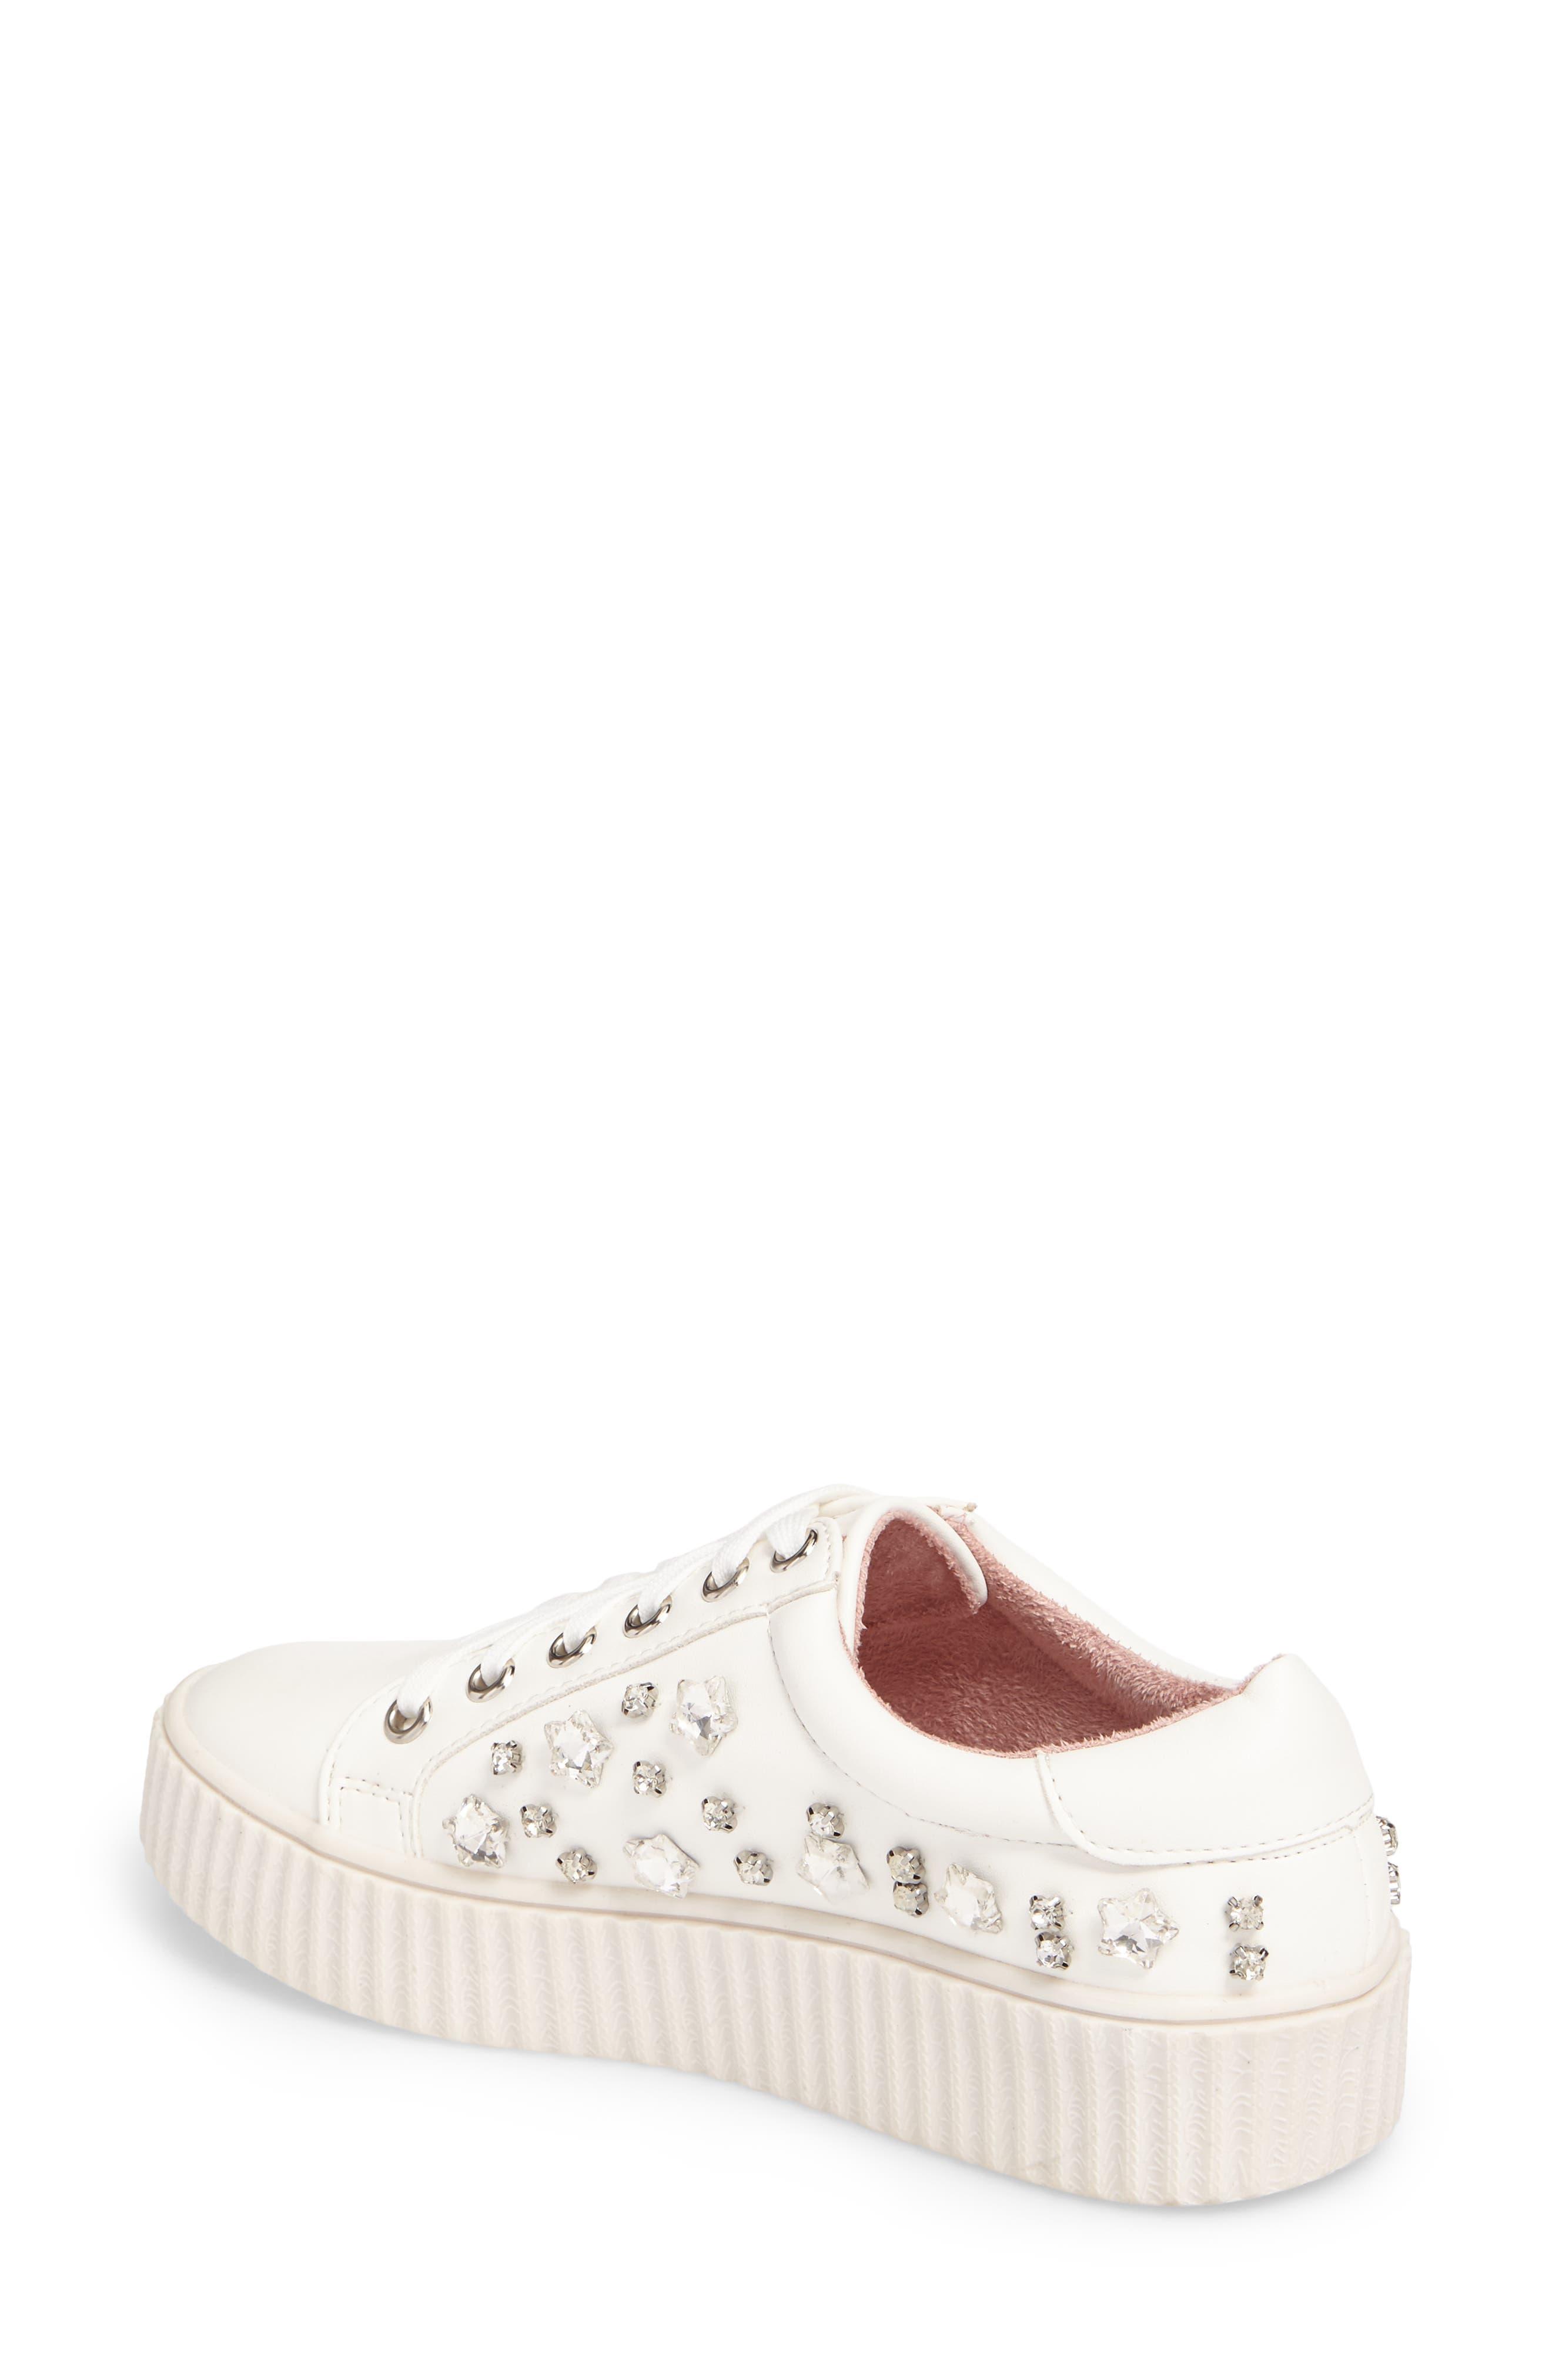 Pam Embellished Platform Sneaker,                             Alternate thumbnail 2, color,                             White